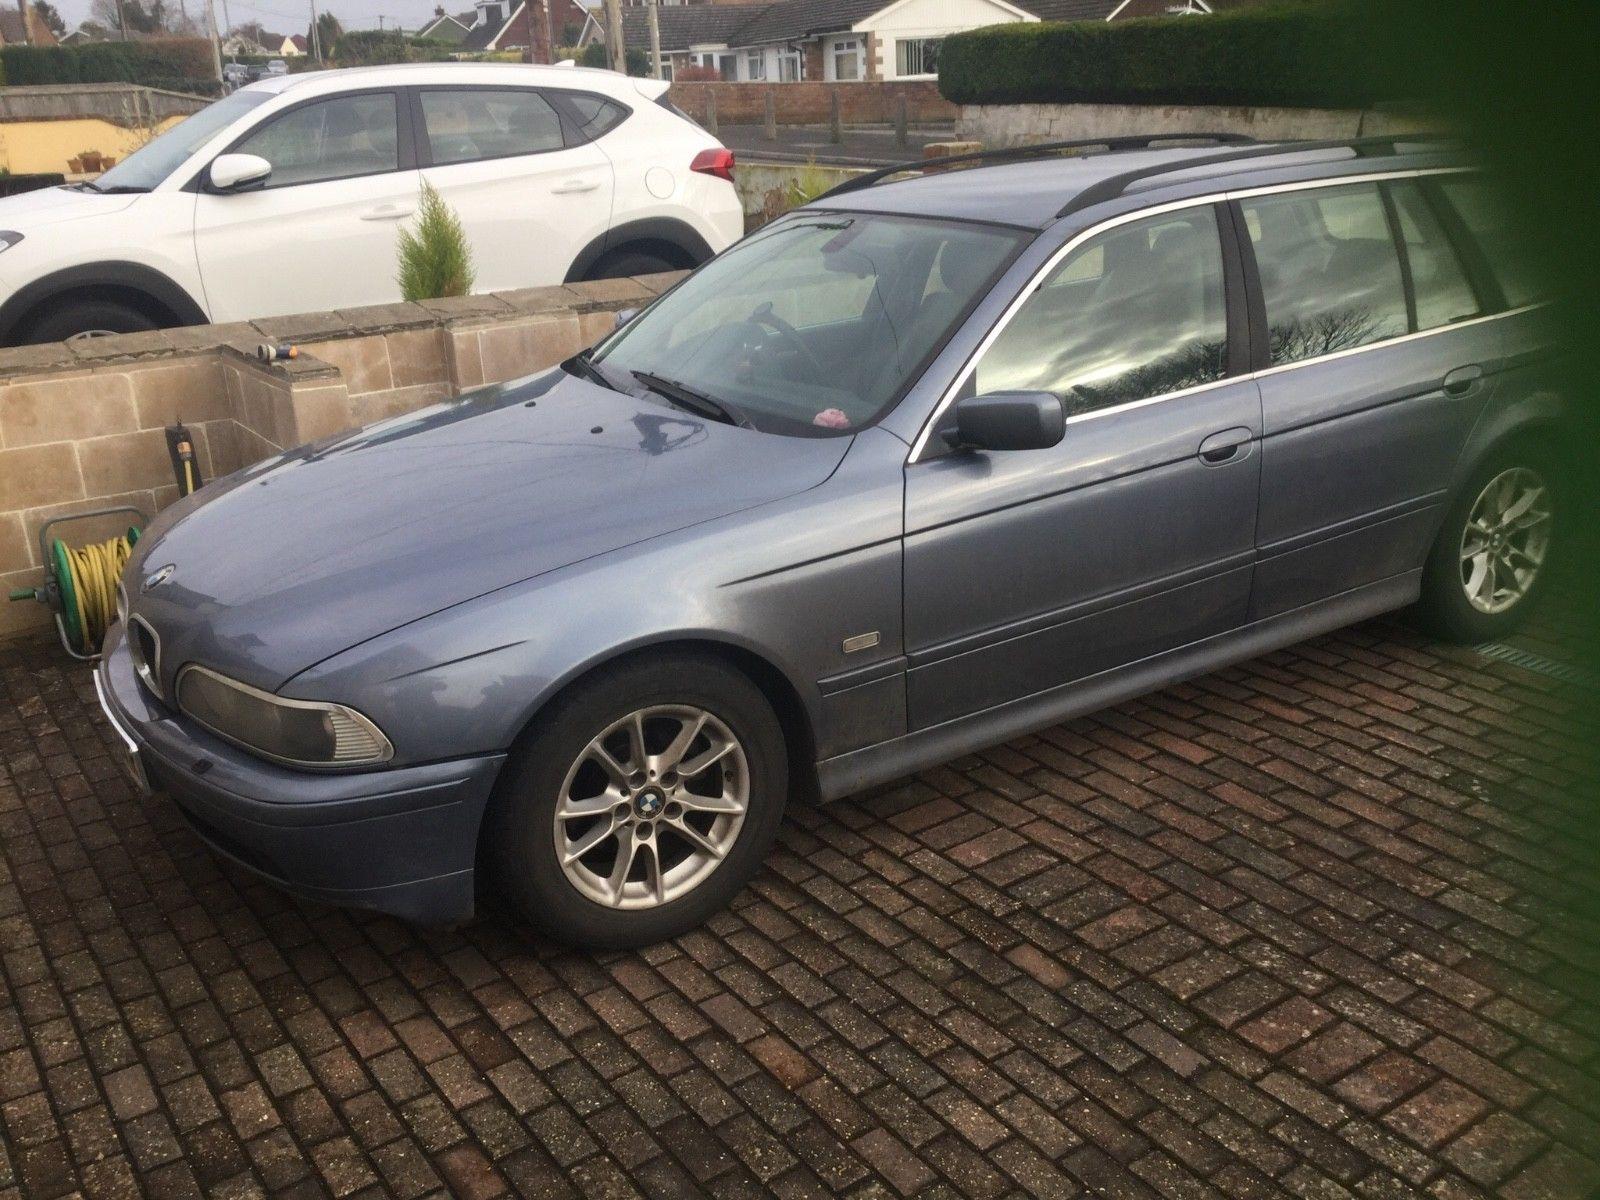 BMW 525d Touring Spares repair UK Salvage Cars